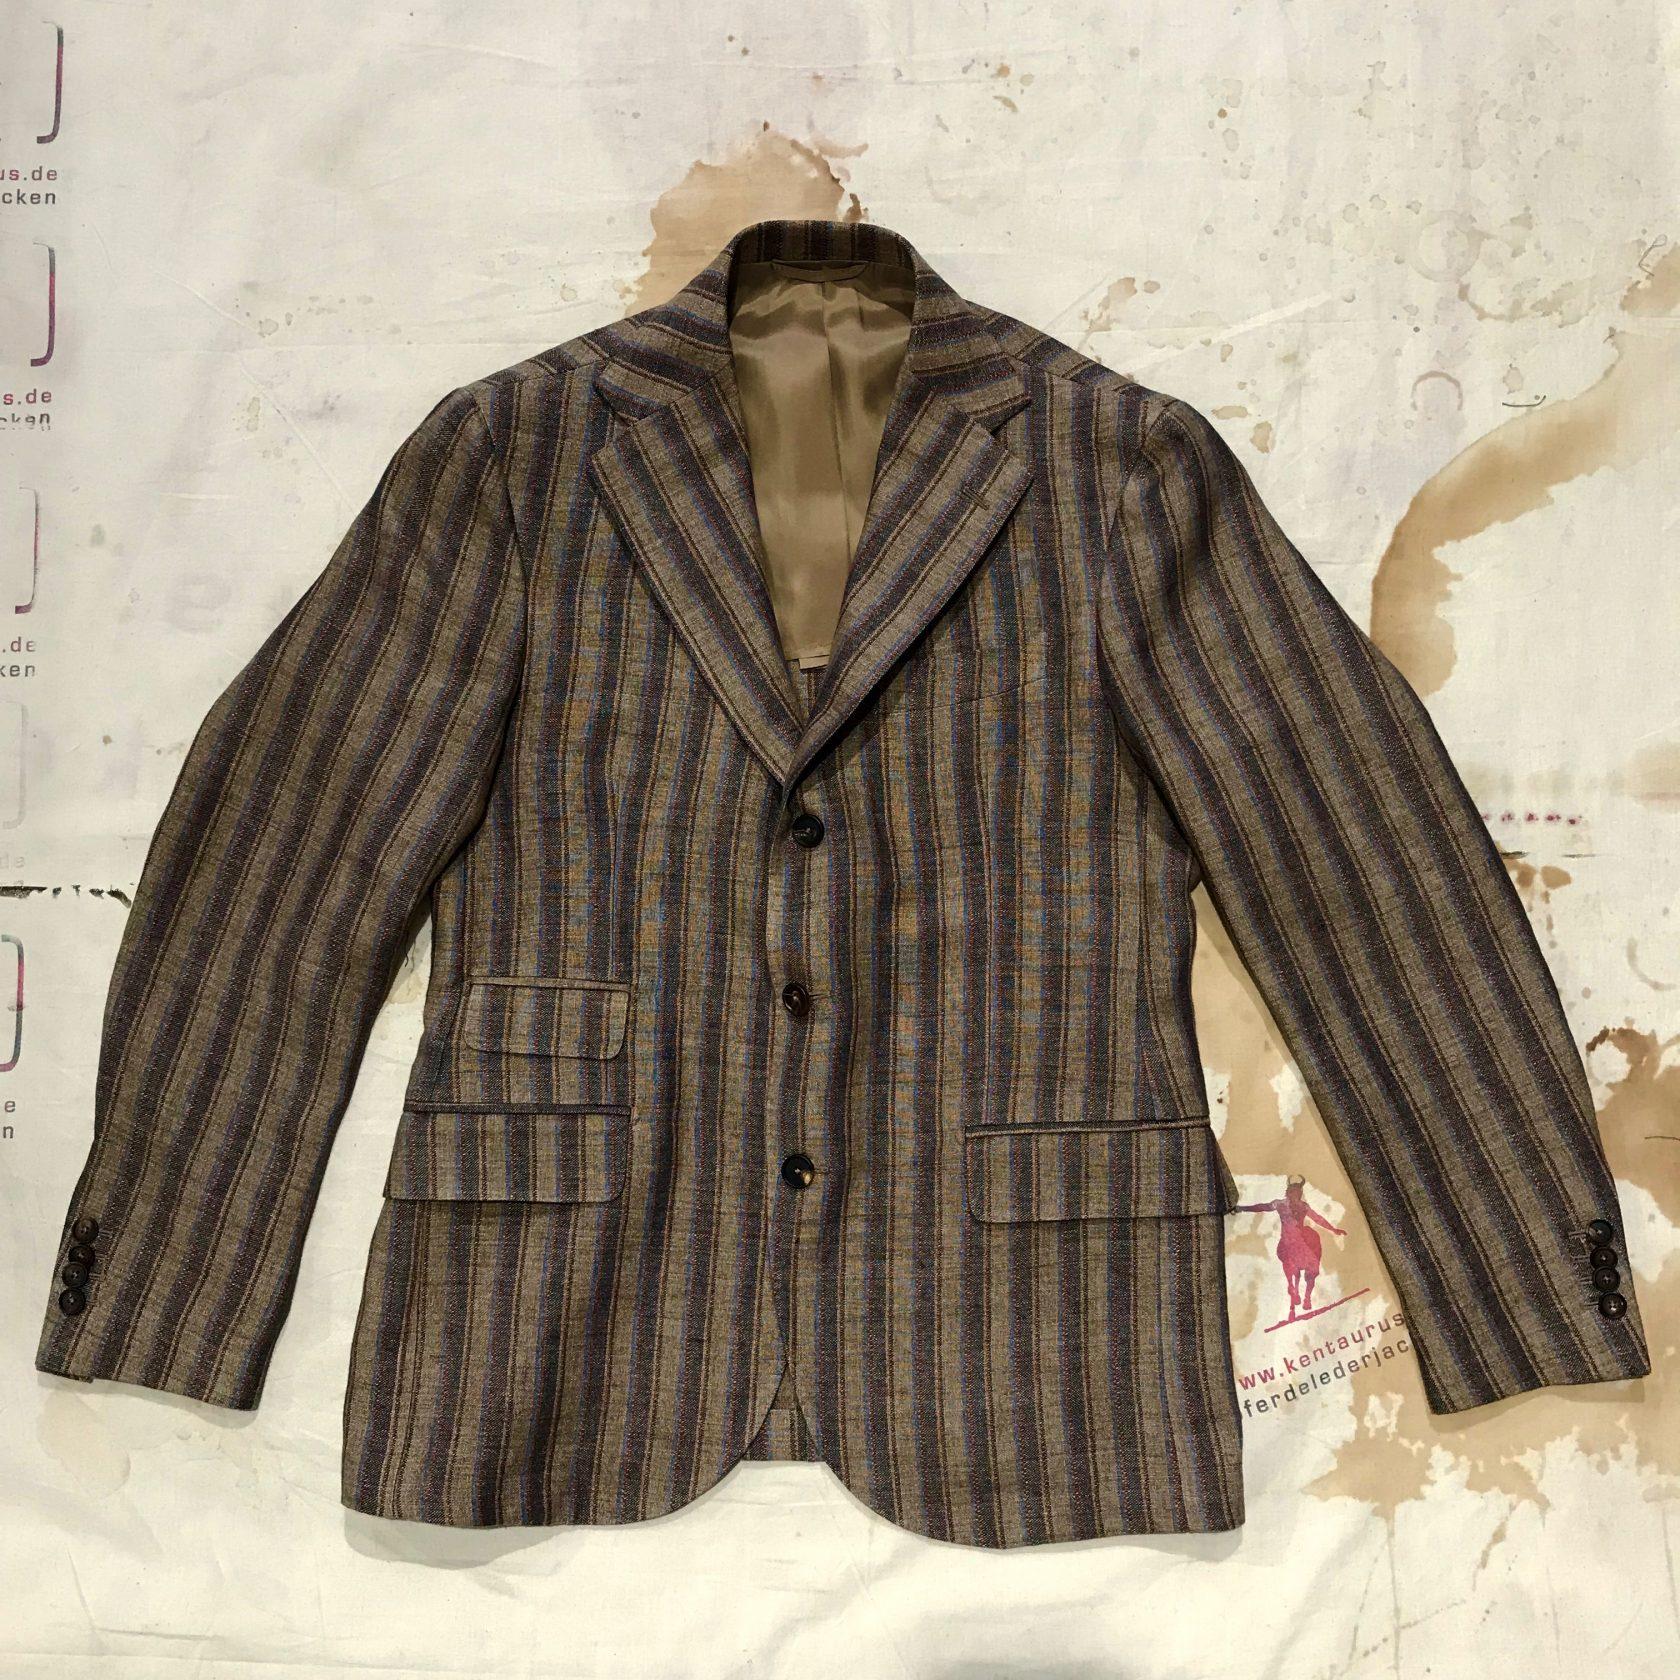 S.Piccolo striped linen jacket